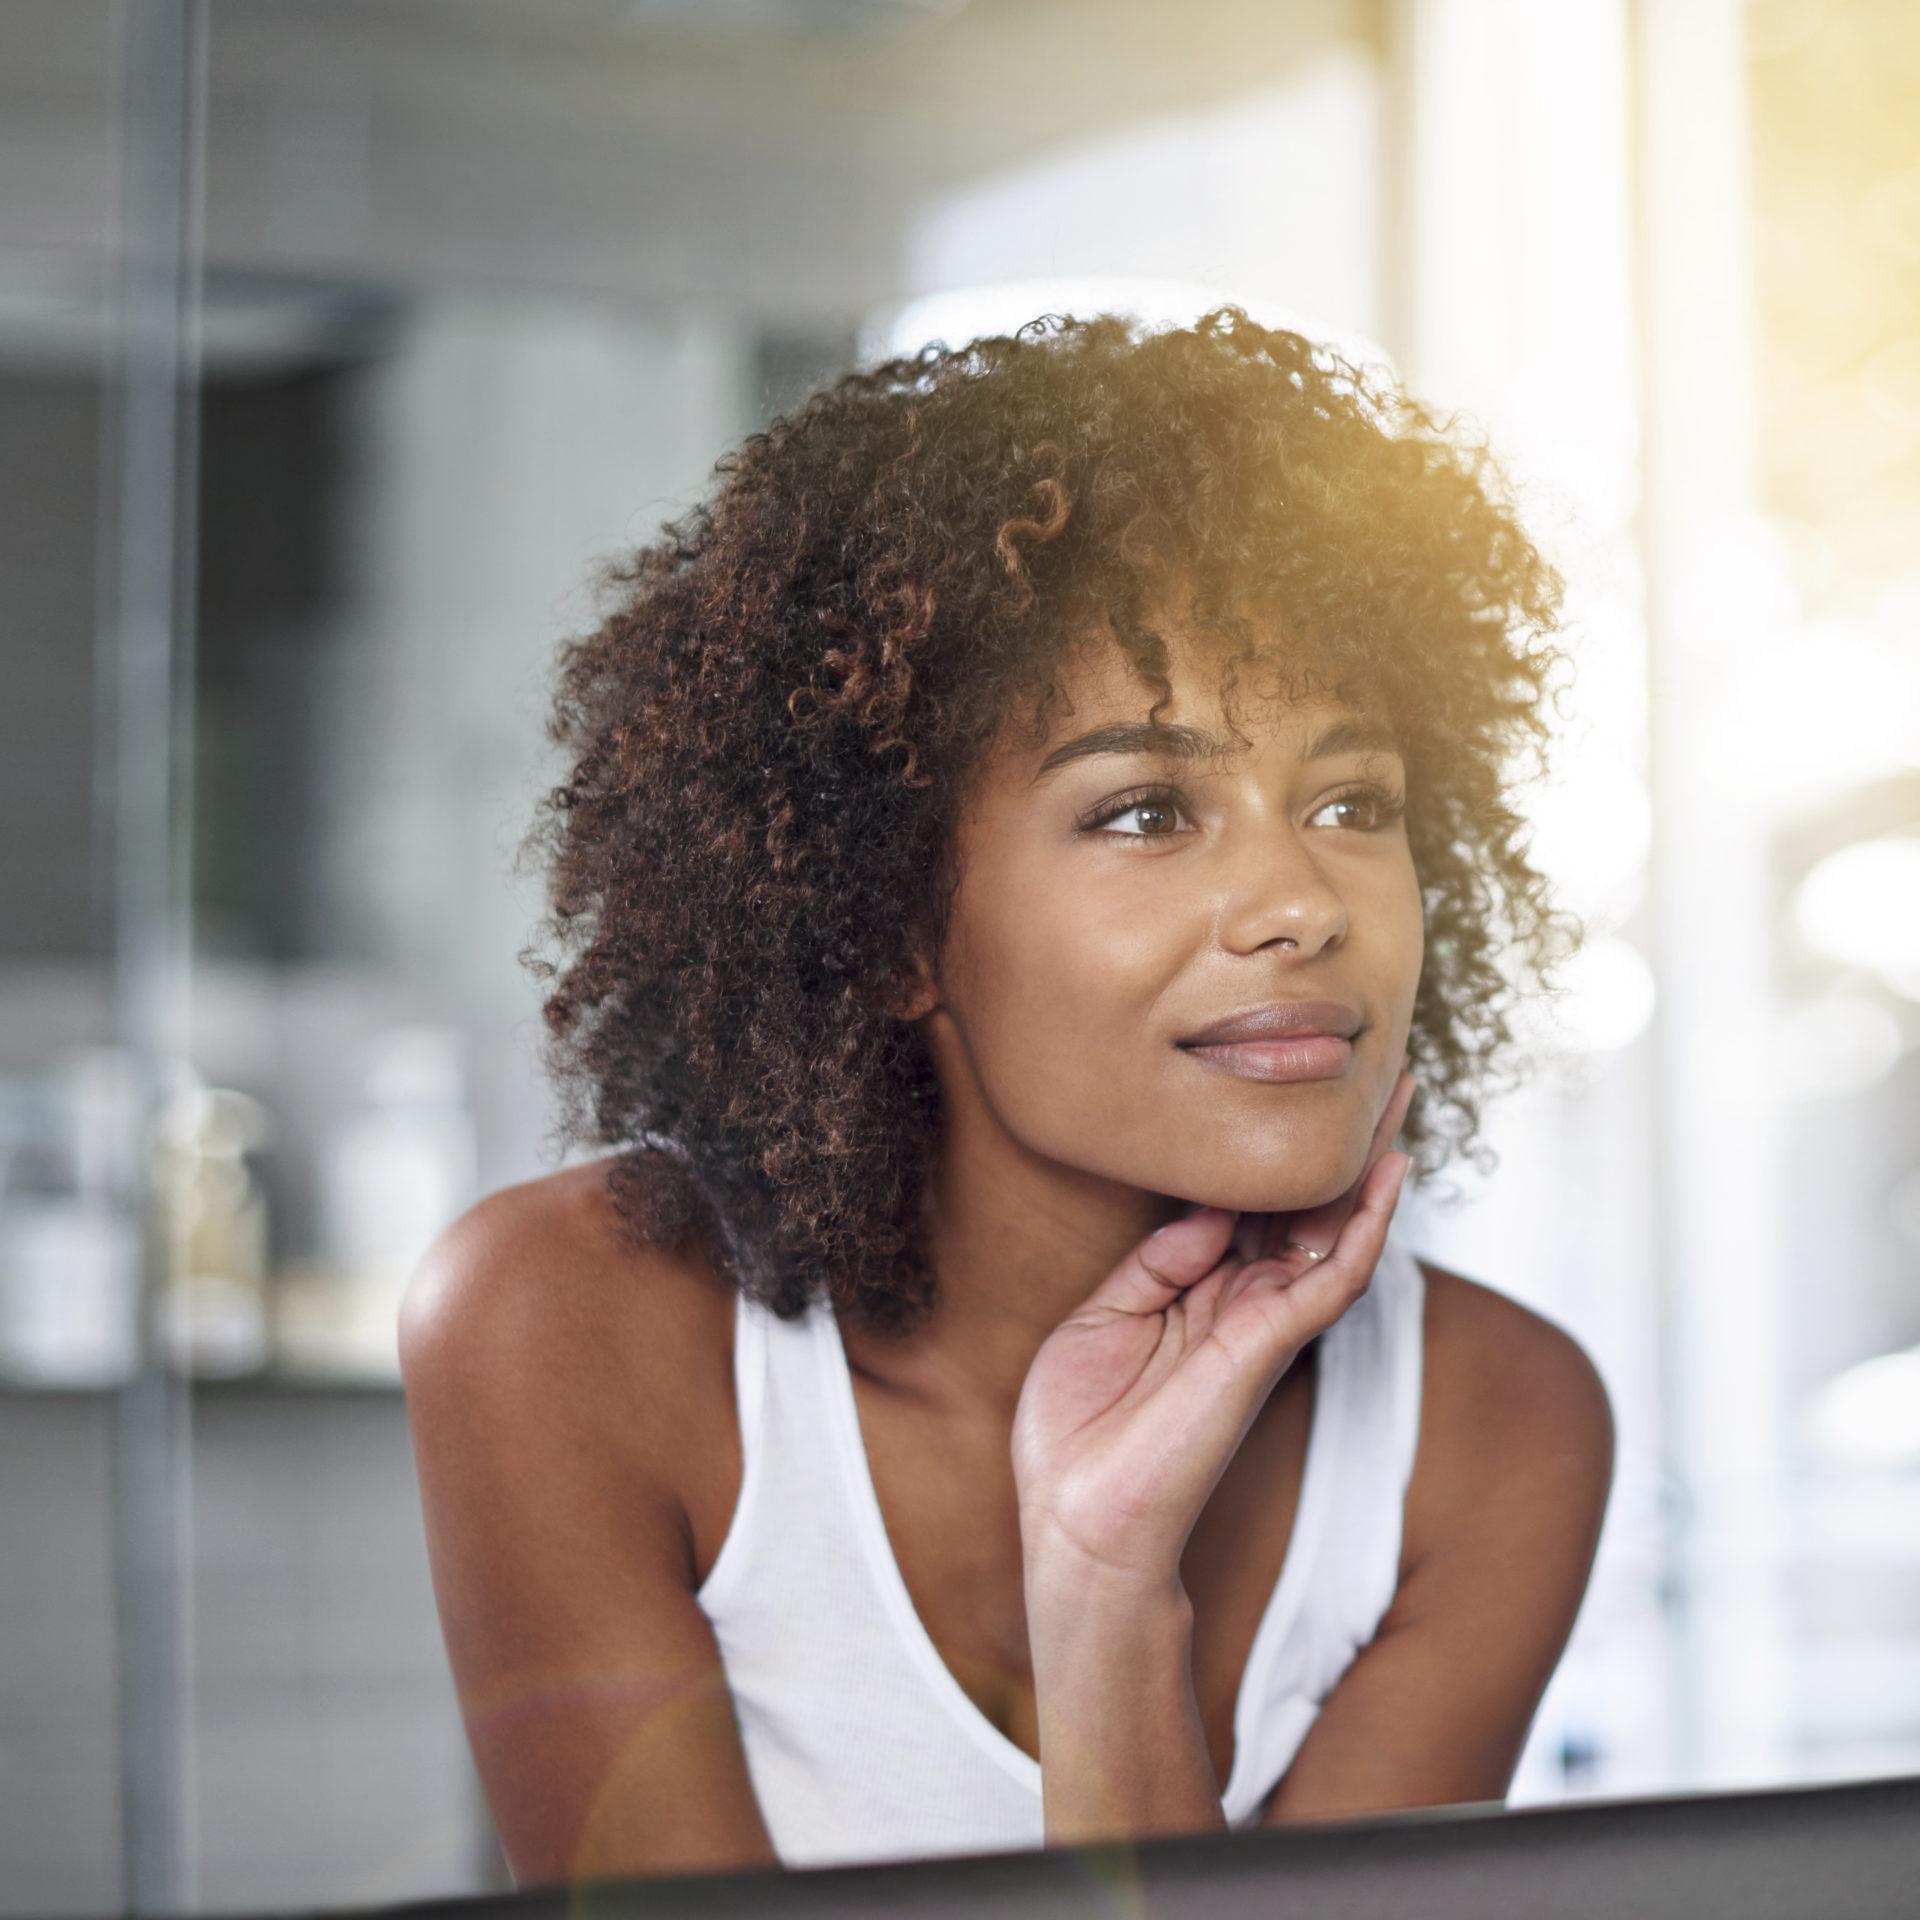 woman in mirror touching skin